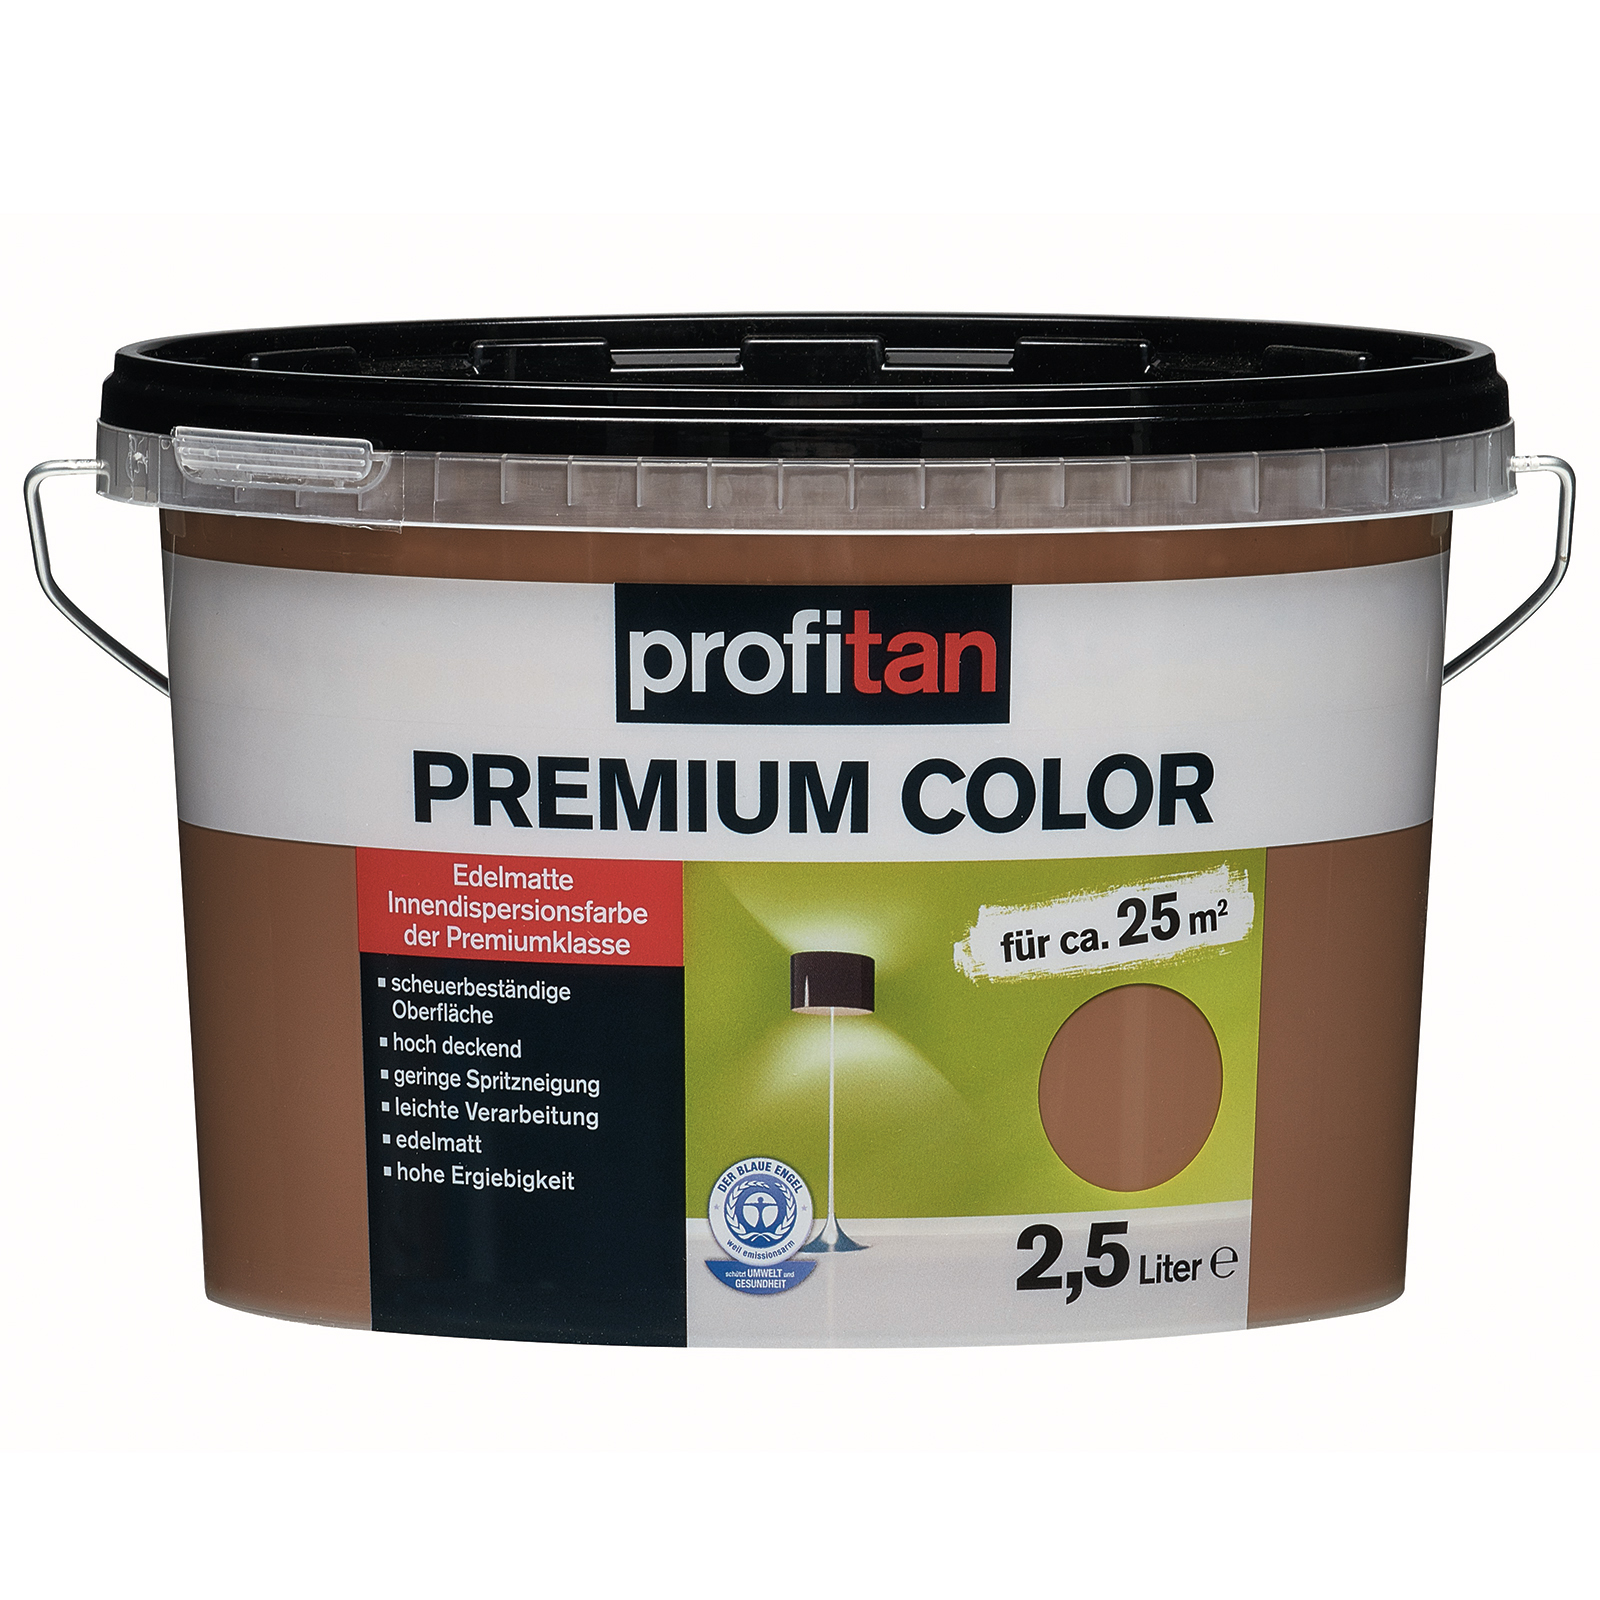 Profitan Wandfarbe Premium Color